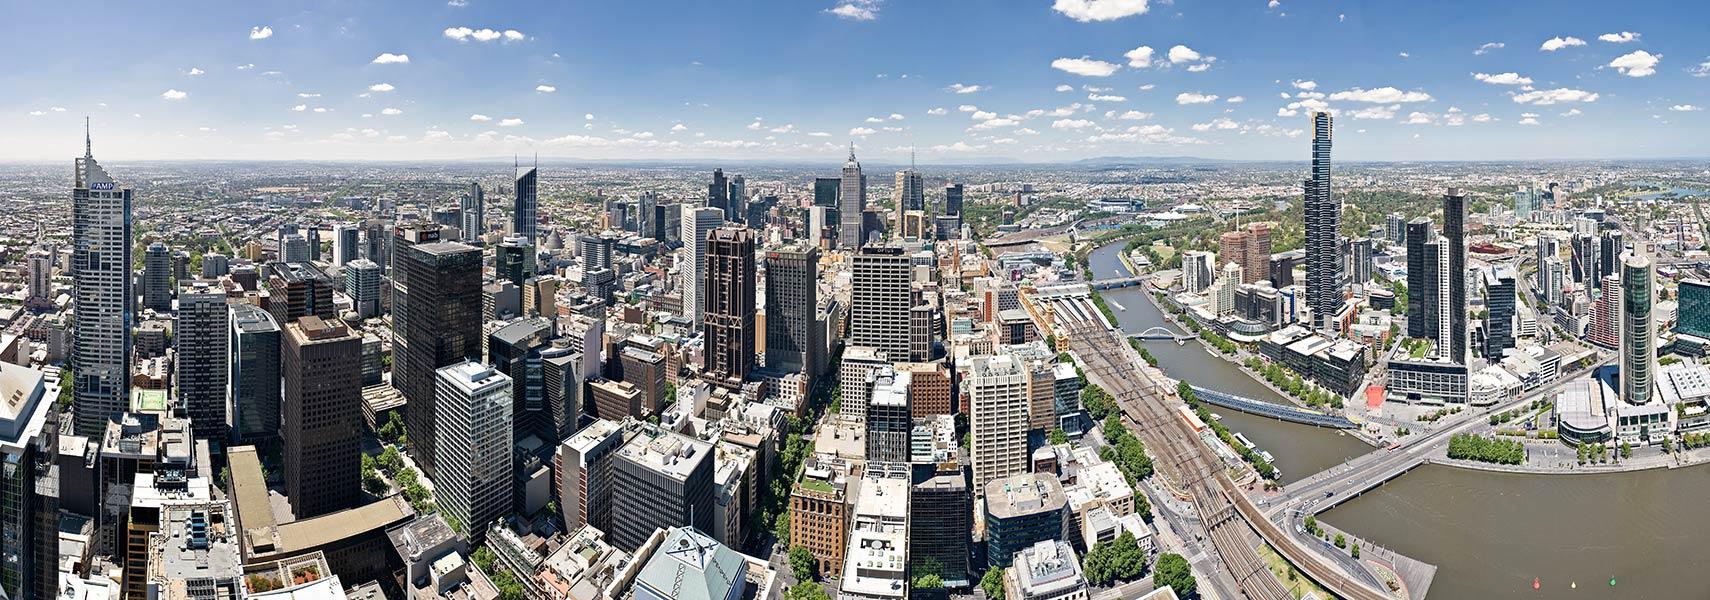 Melbourne Australia City Map.Google Map Of Melbourne Victoria Australia Nations Online Project